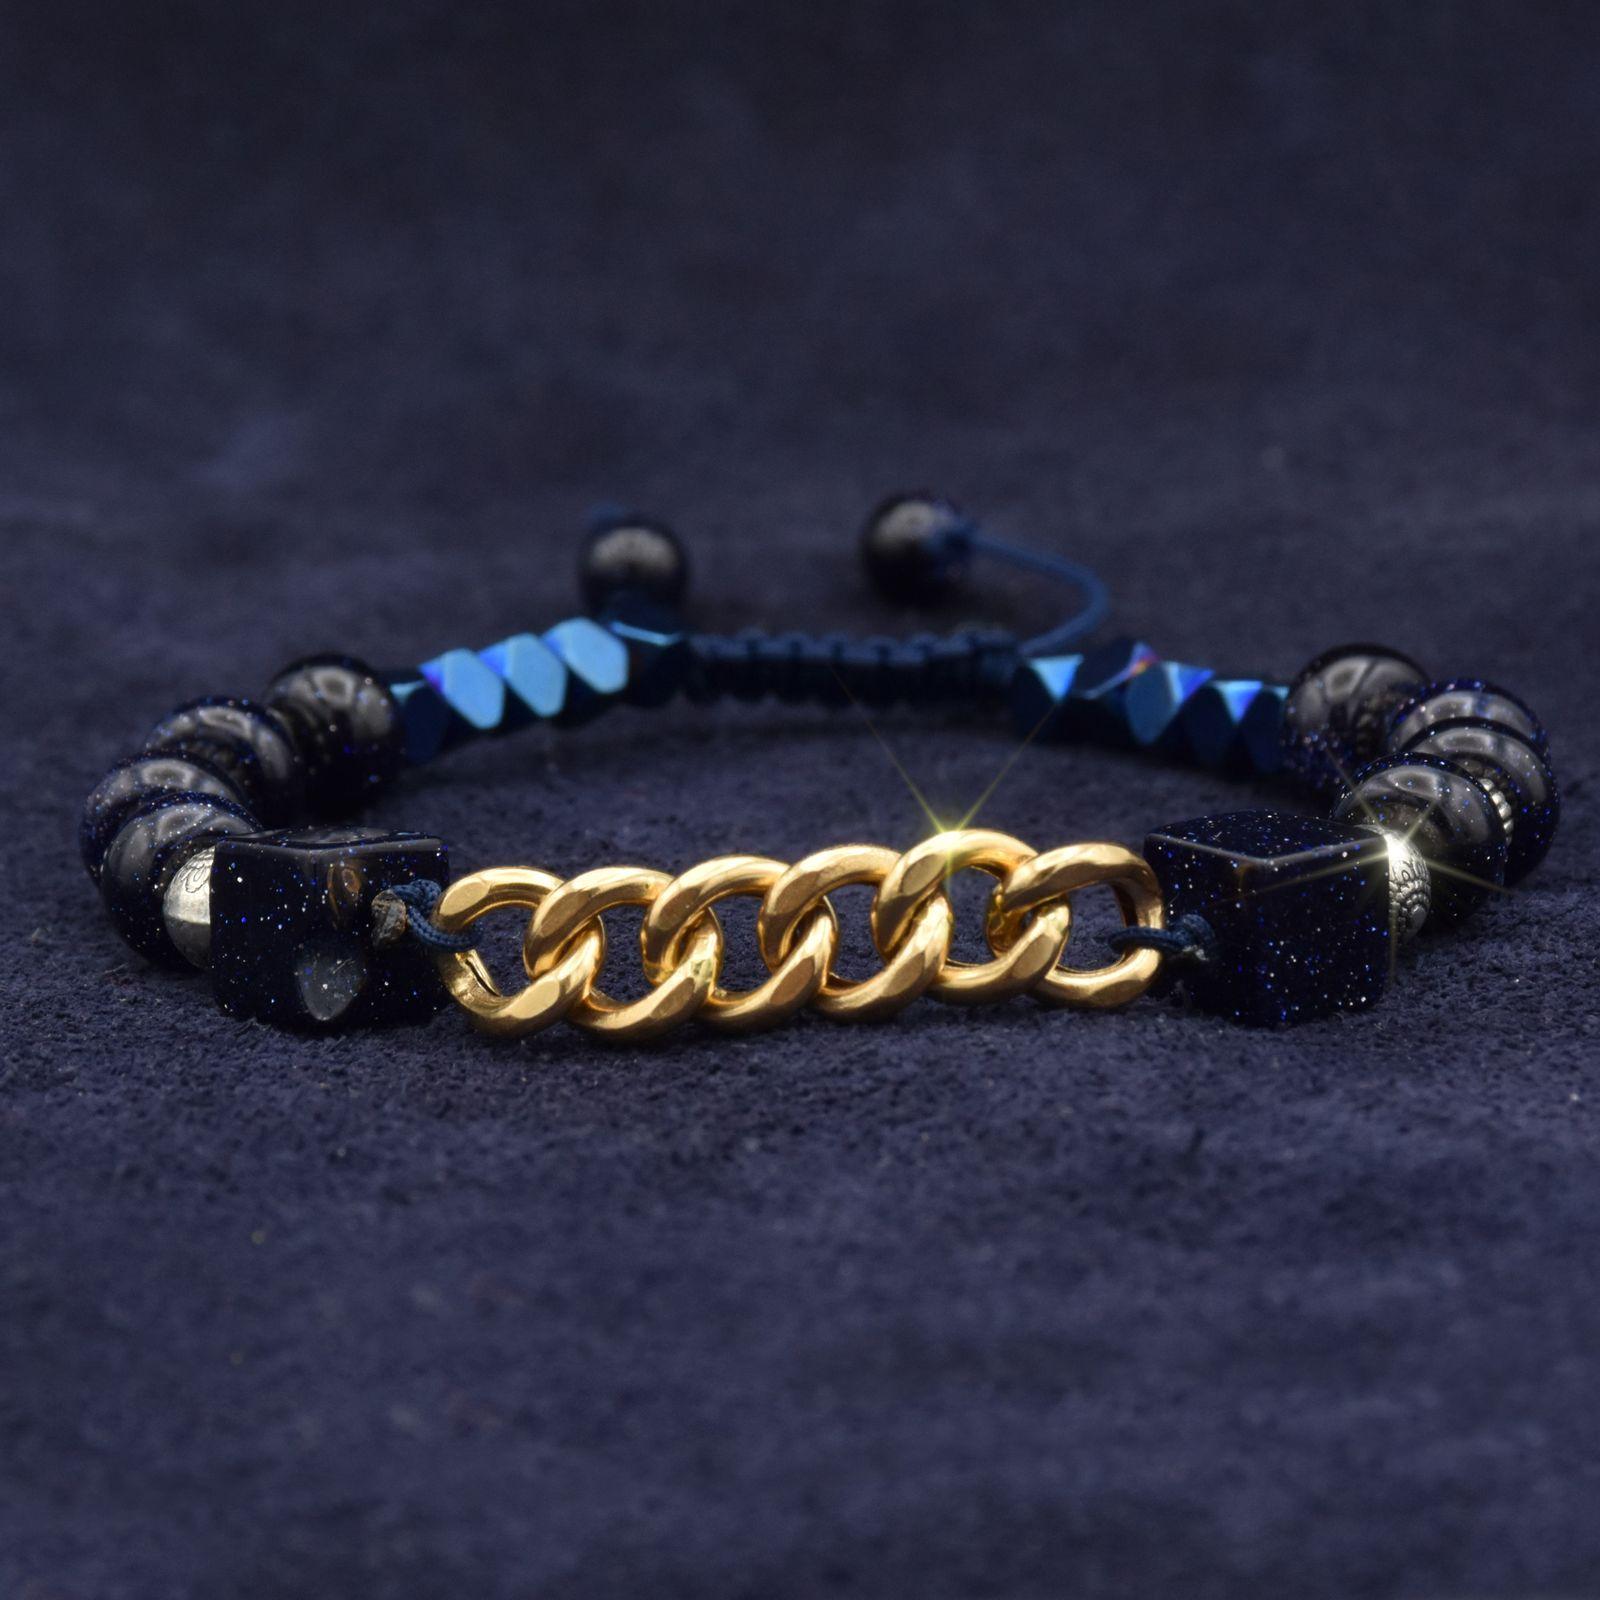 دستبند طلا 18 عیار زنانه آمانژ کد 1006D8951 -  - 3